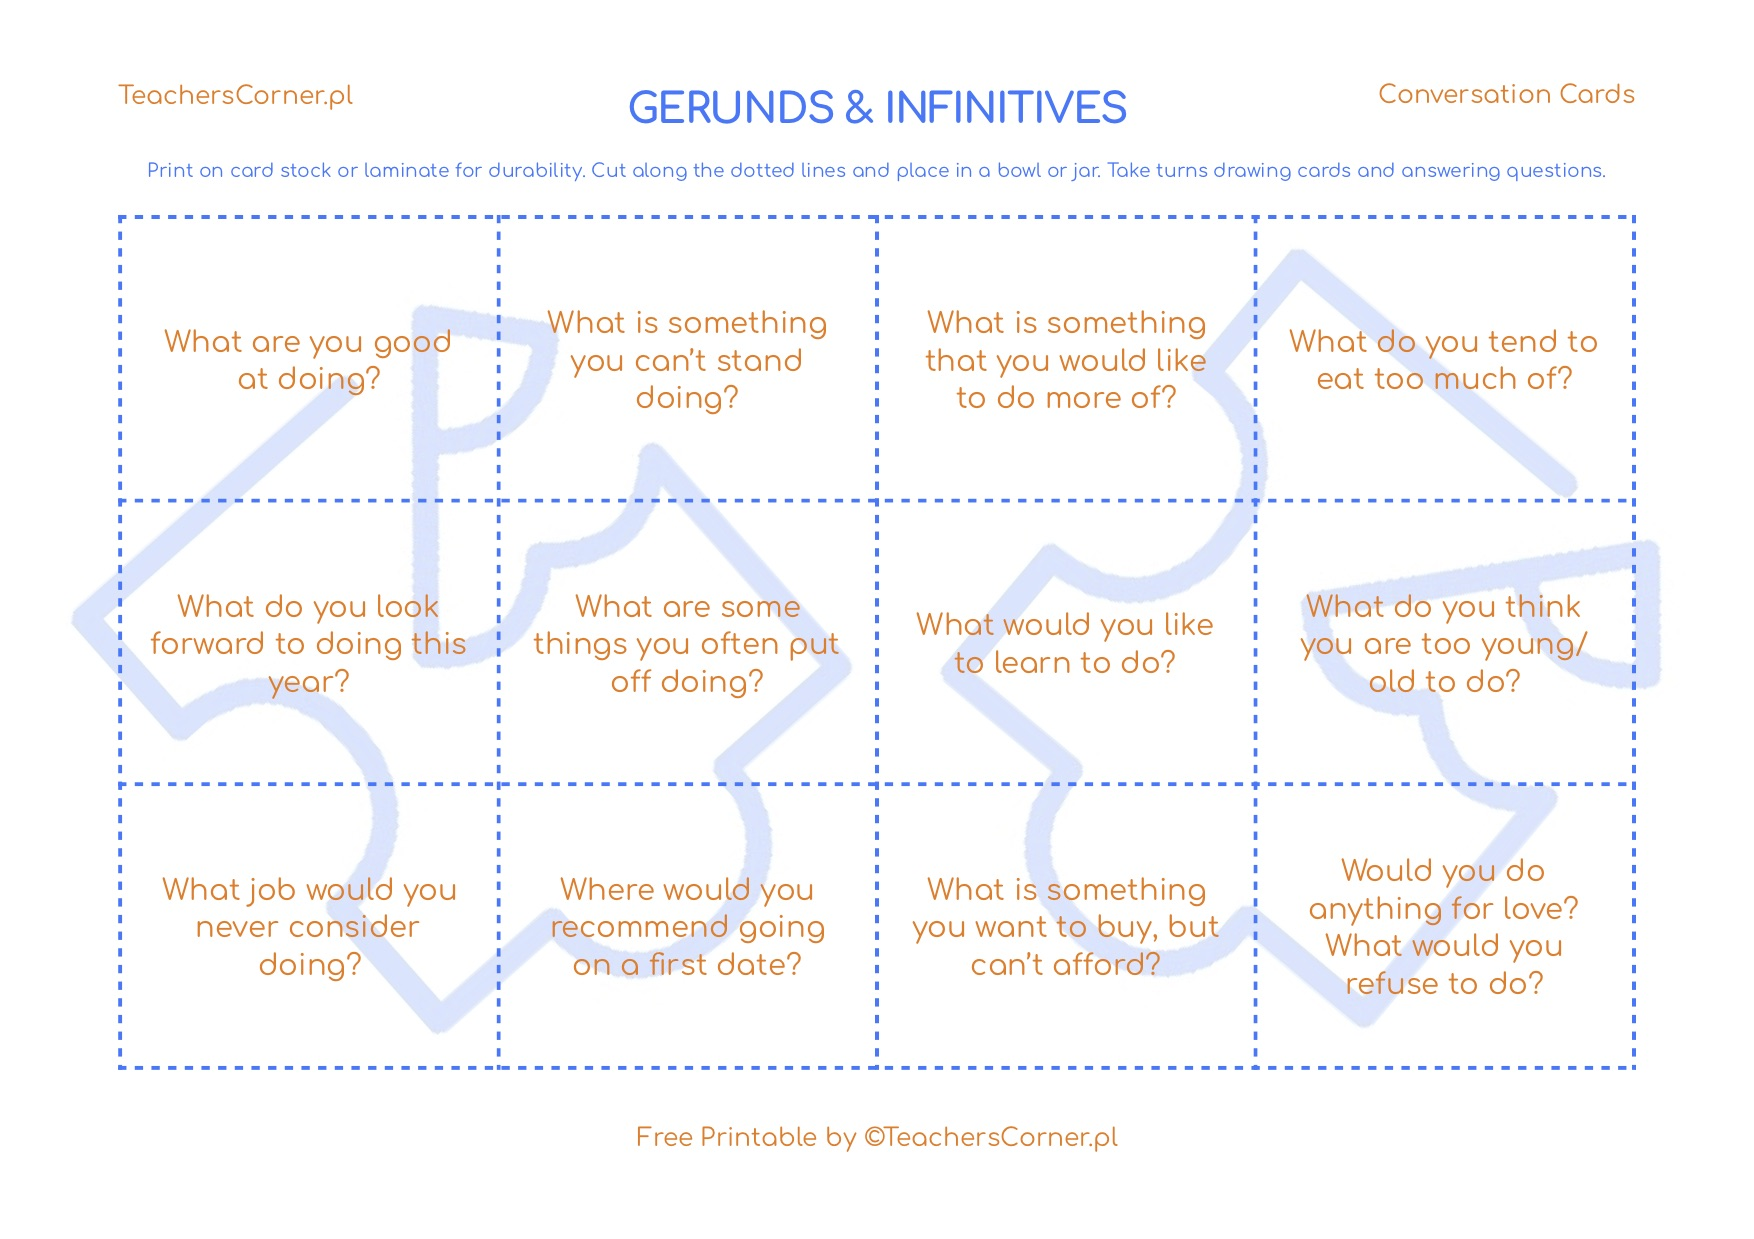 Gerunds and infinitives conversation cards